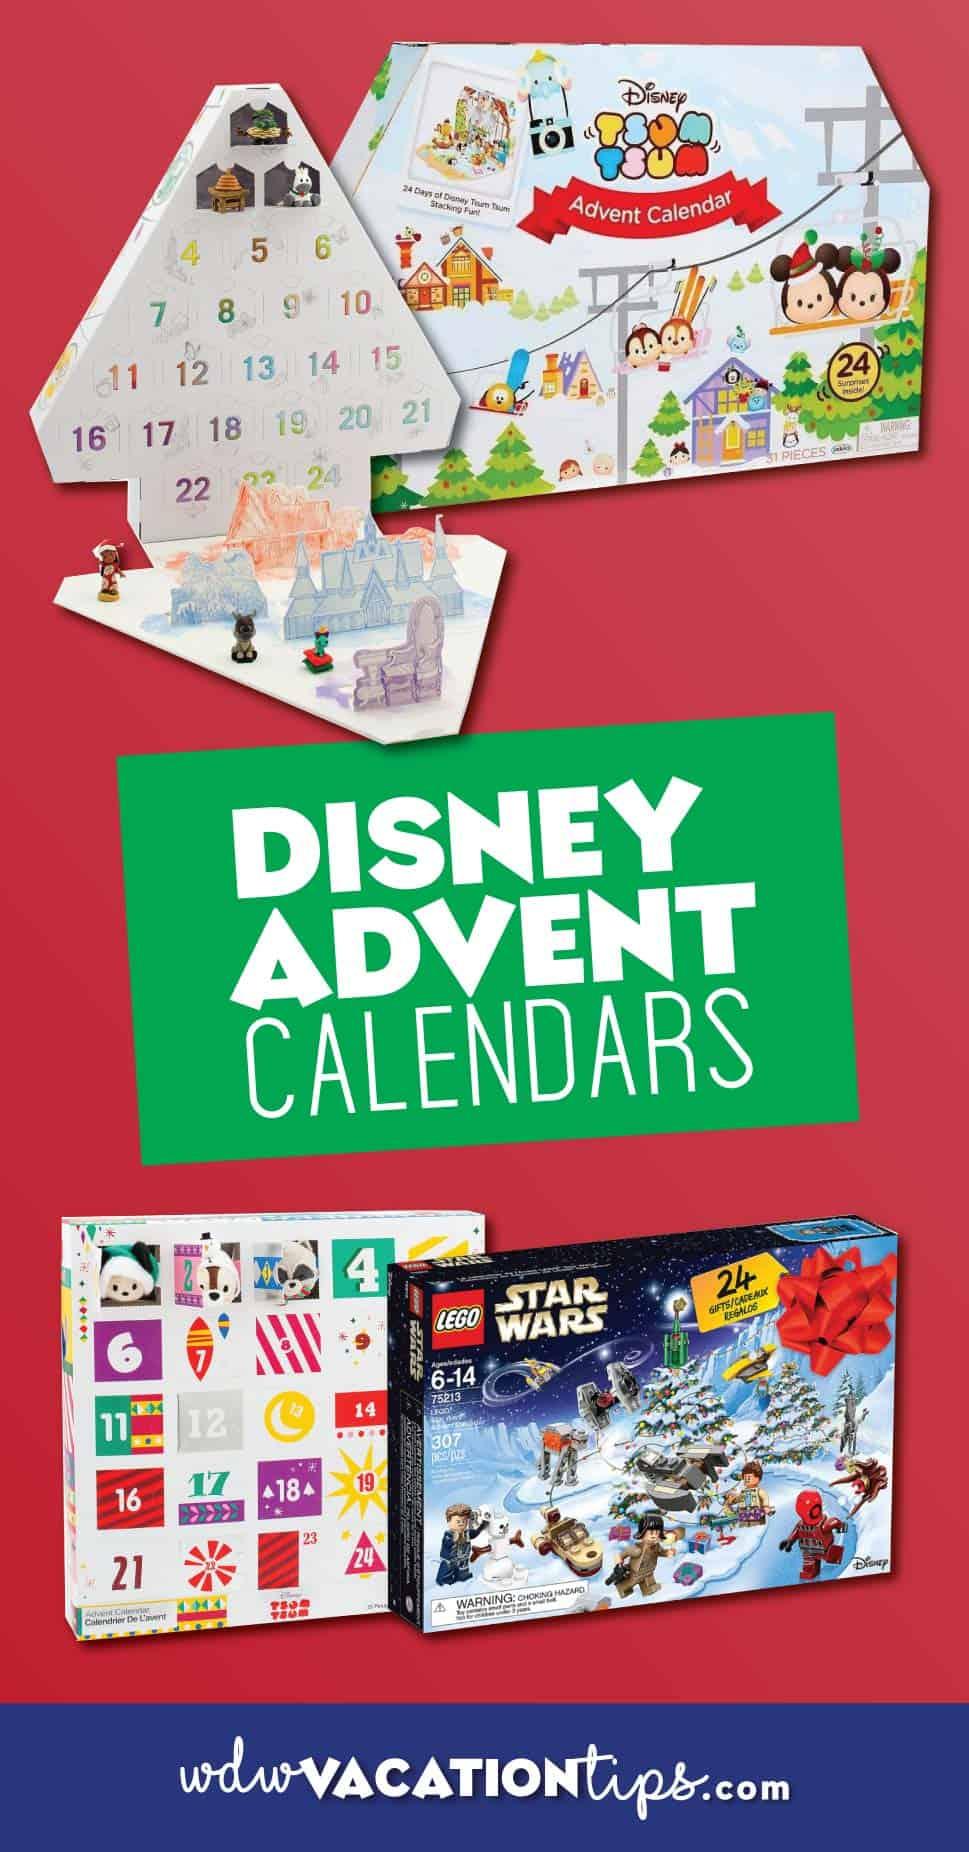 Disney Advent Calendars